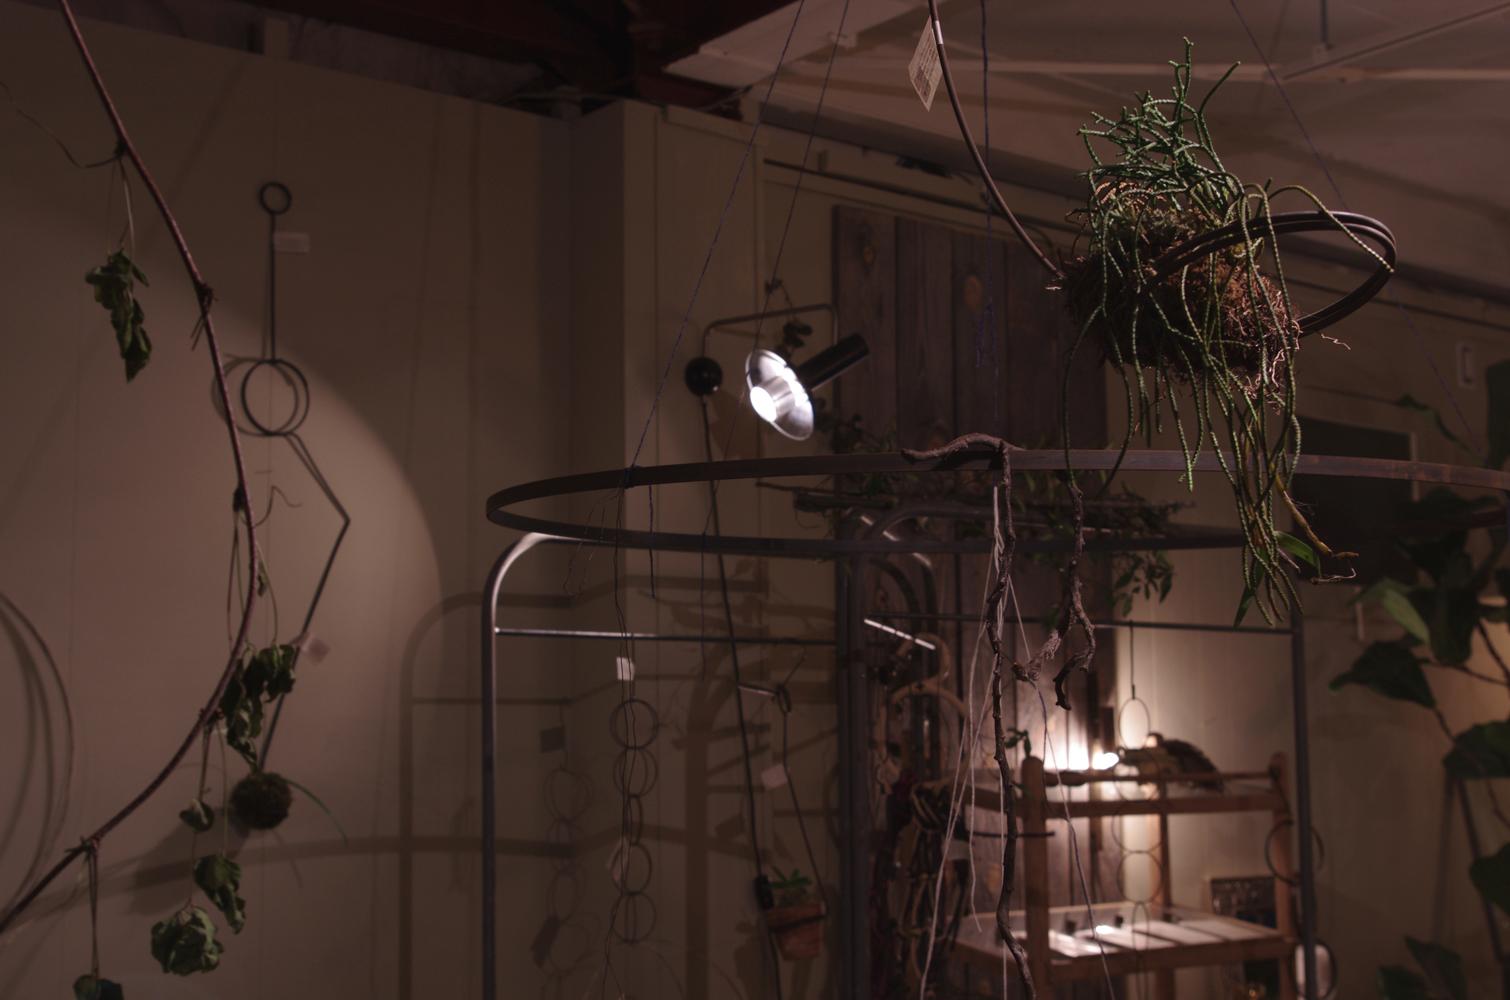 tipura-studio-ironworks-exhibition-13